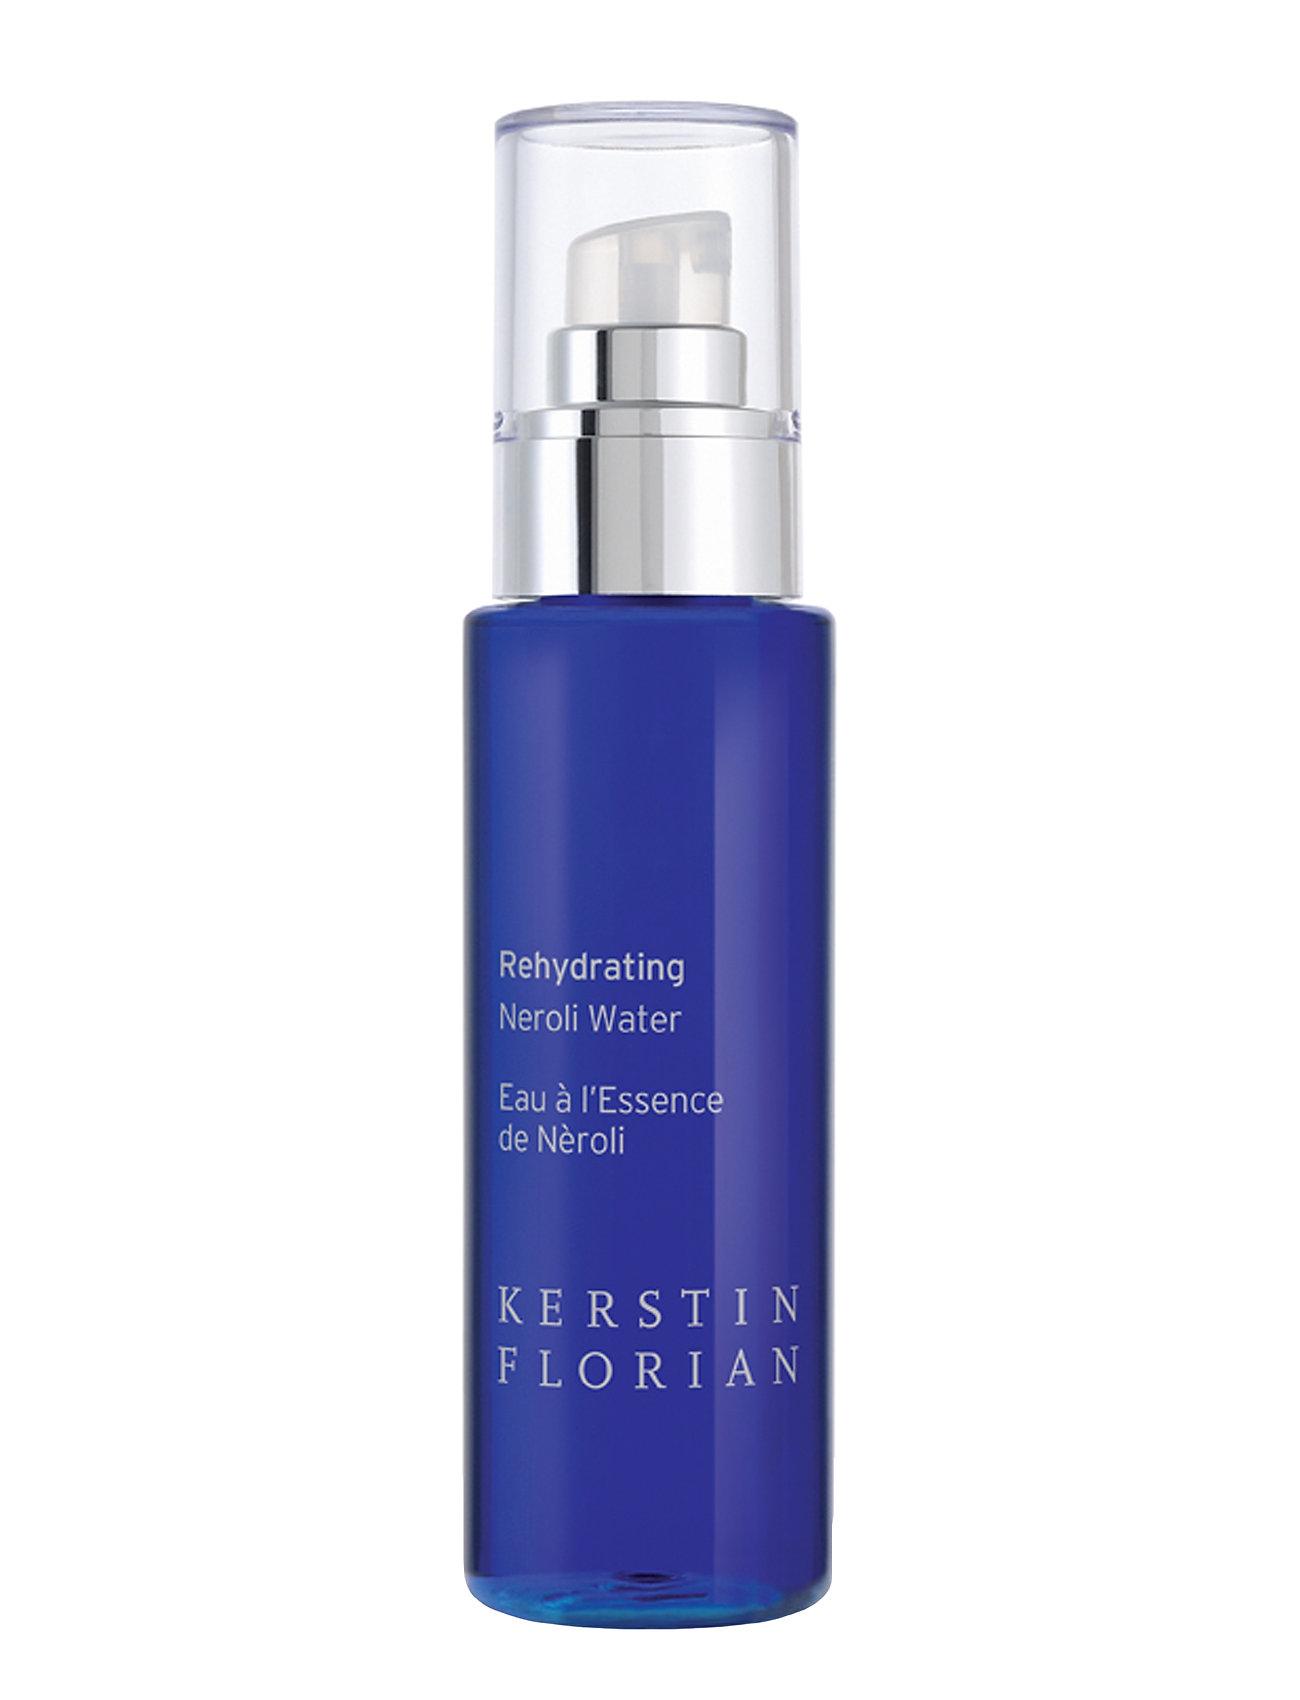 Image of Rehydrating Neroli Water Beauty WOMEN Skin Care Face Face Mist Nude Kerstin Florian (3077236737)